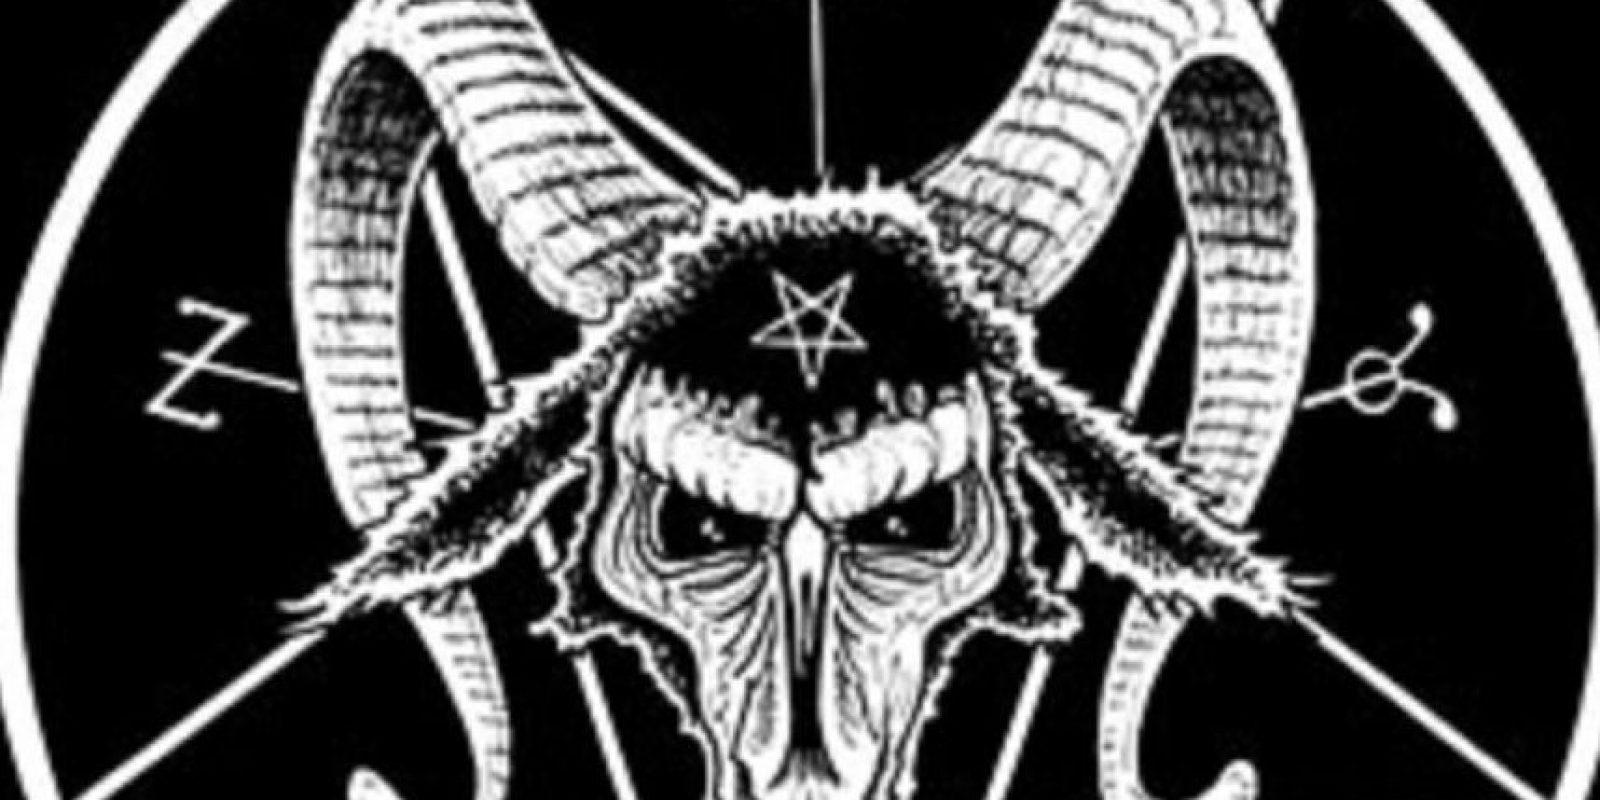 El satanismo moderno data de 1960. Foto:vía The Satanic Temple